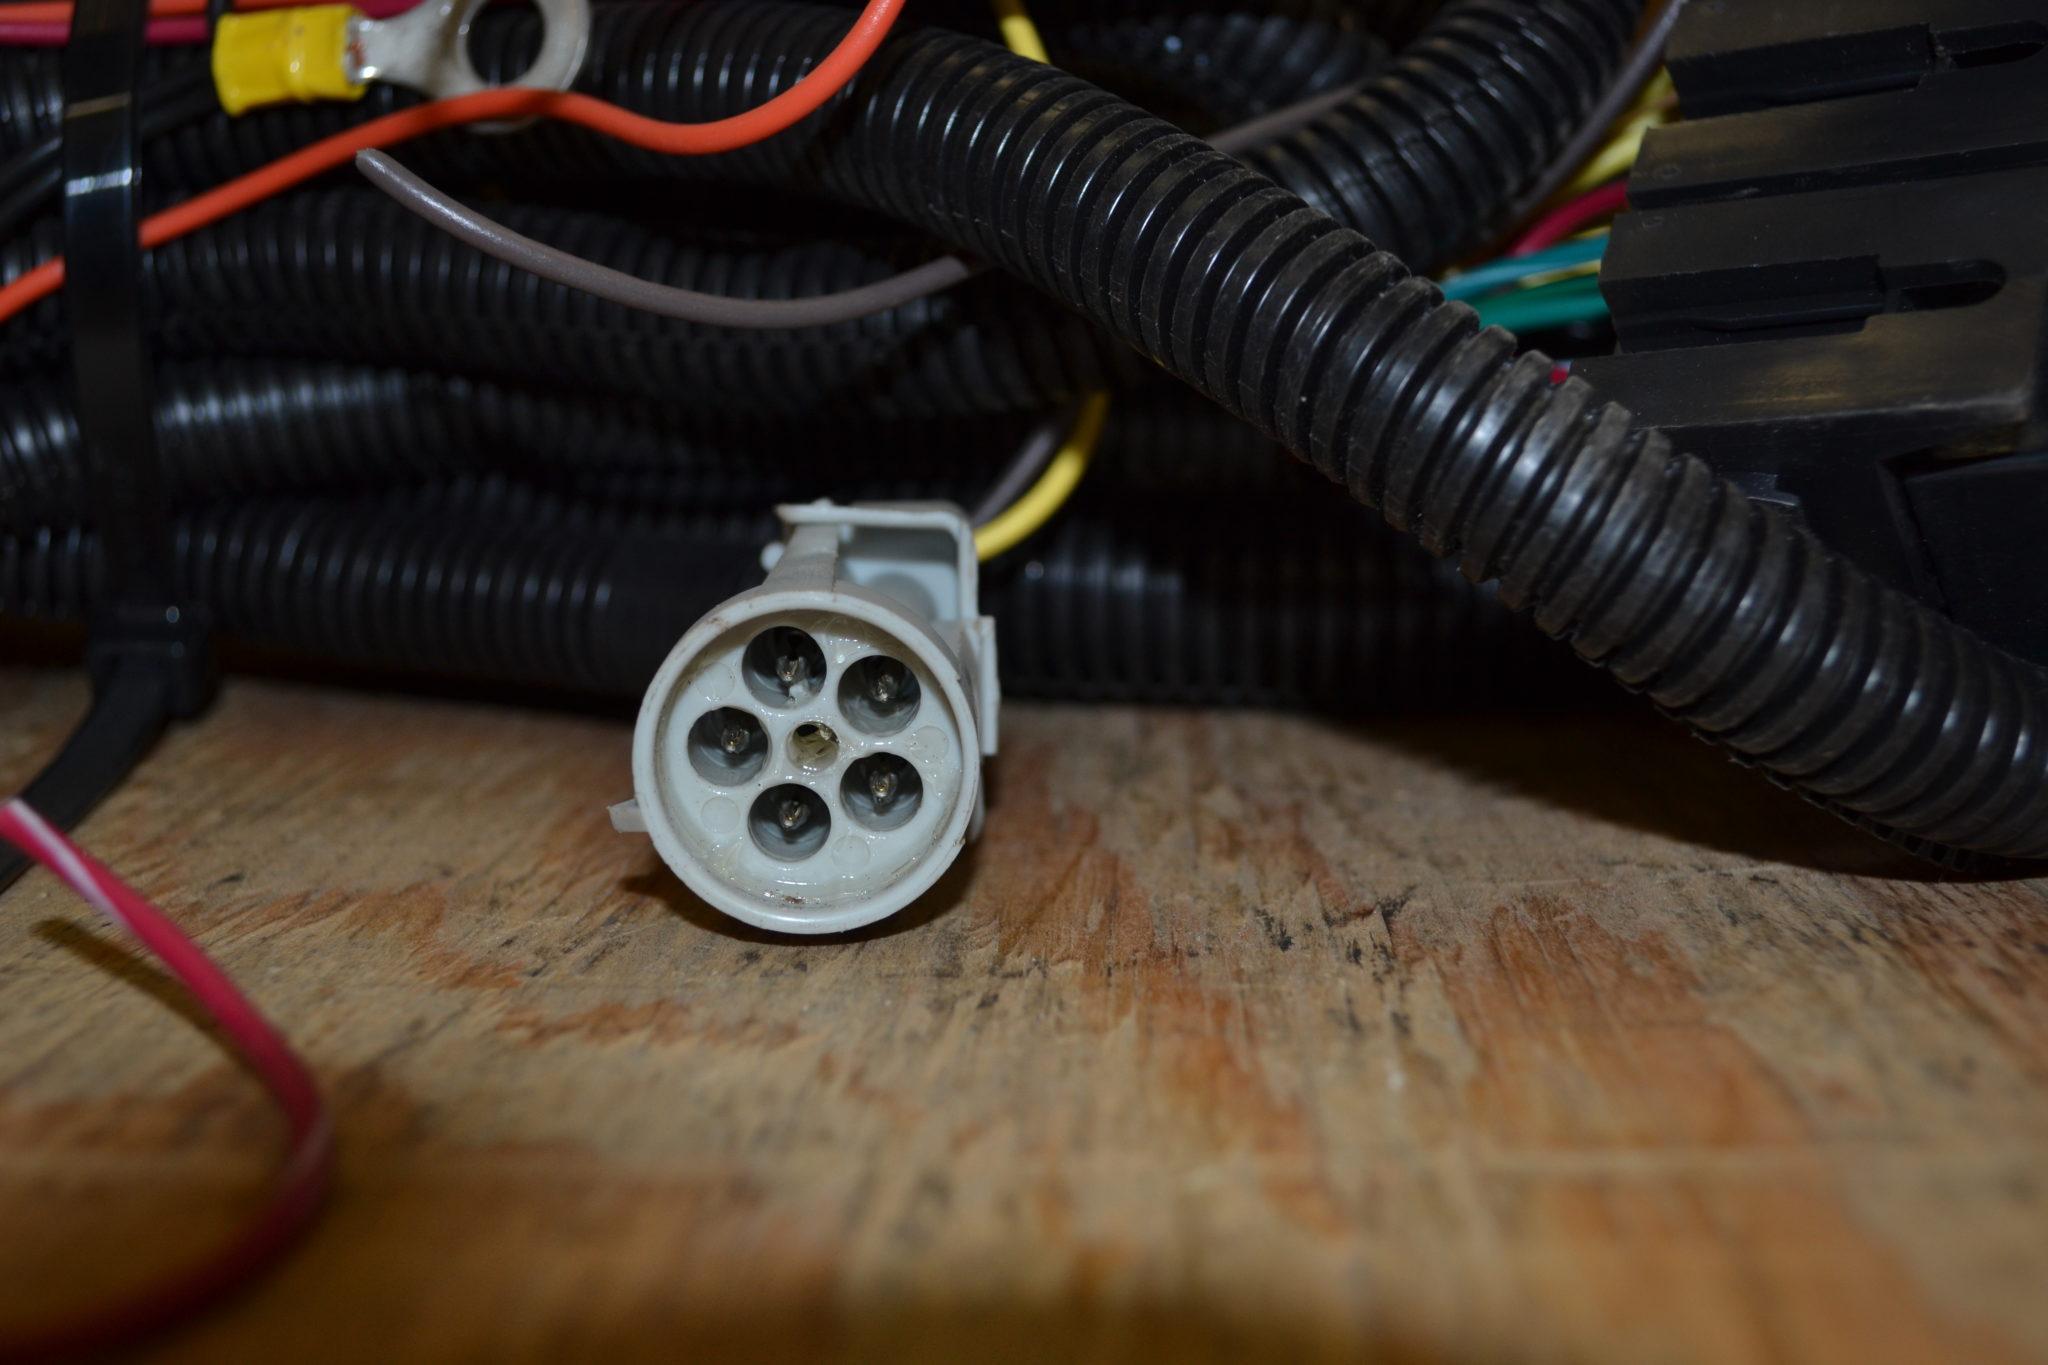 hiniker wiring harness    hiniker    snowplow underhood wire    harness    toppers and     hiniker    snowplow underhood wire    harness    toppers and